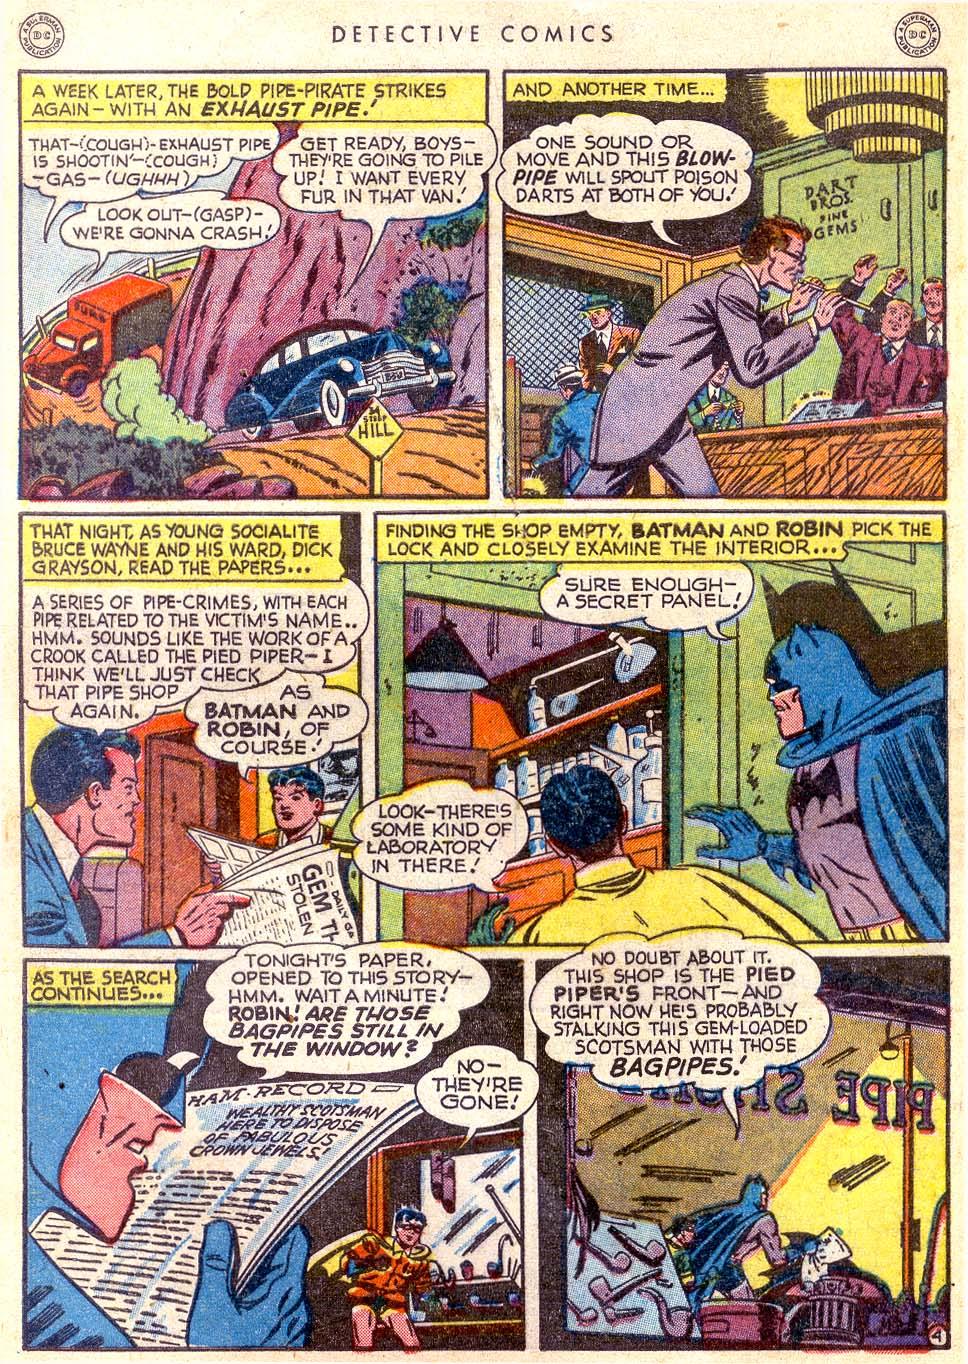 Detective Comics (1937) 143 Page 5